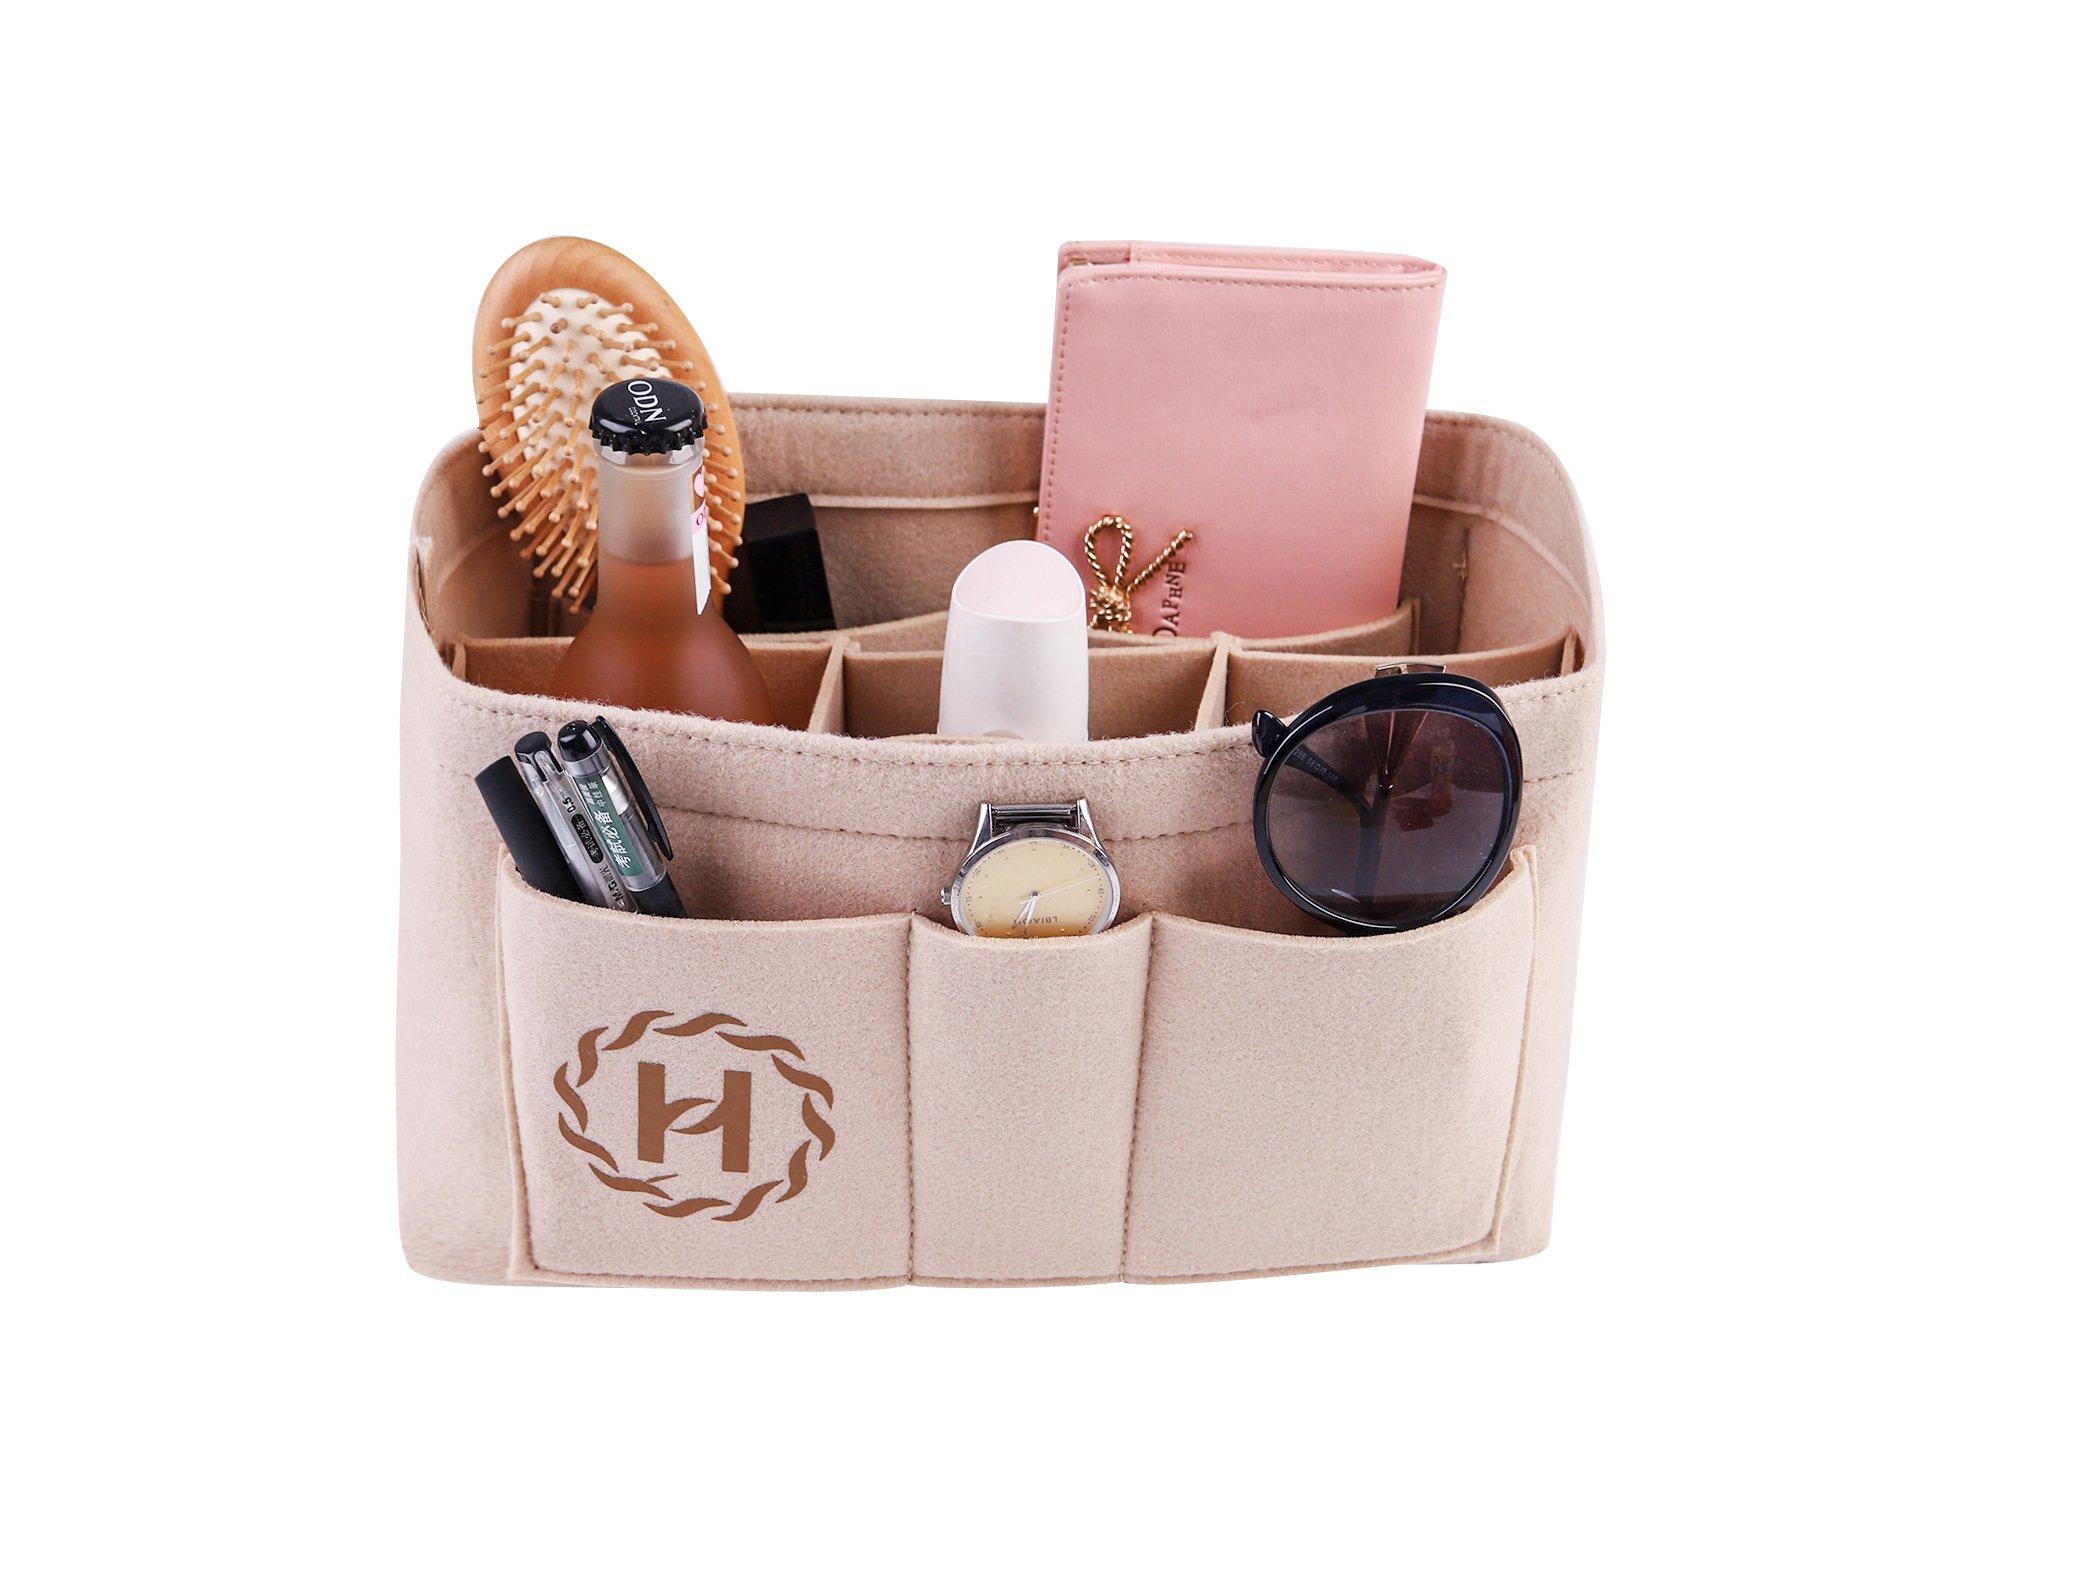 Insert Bag Organizer Bag In Bag For Handbag Purse Organizer (M, beige) by haisai